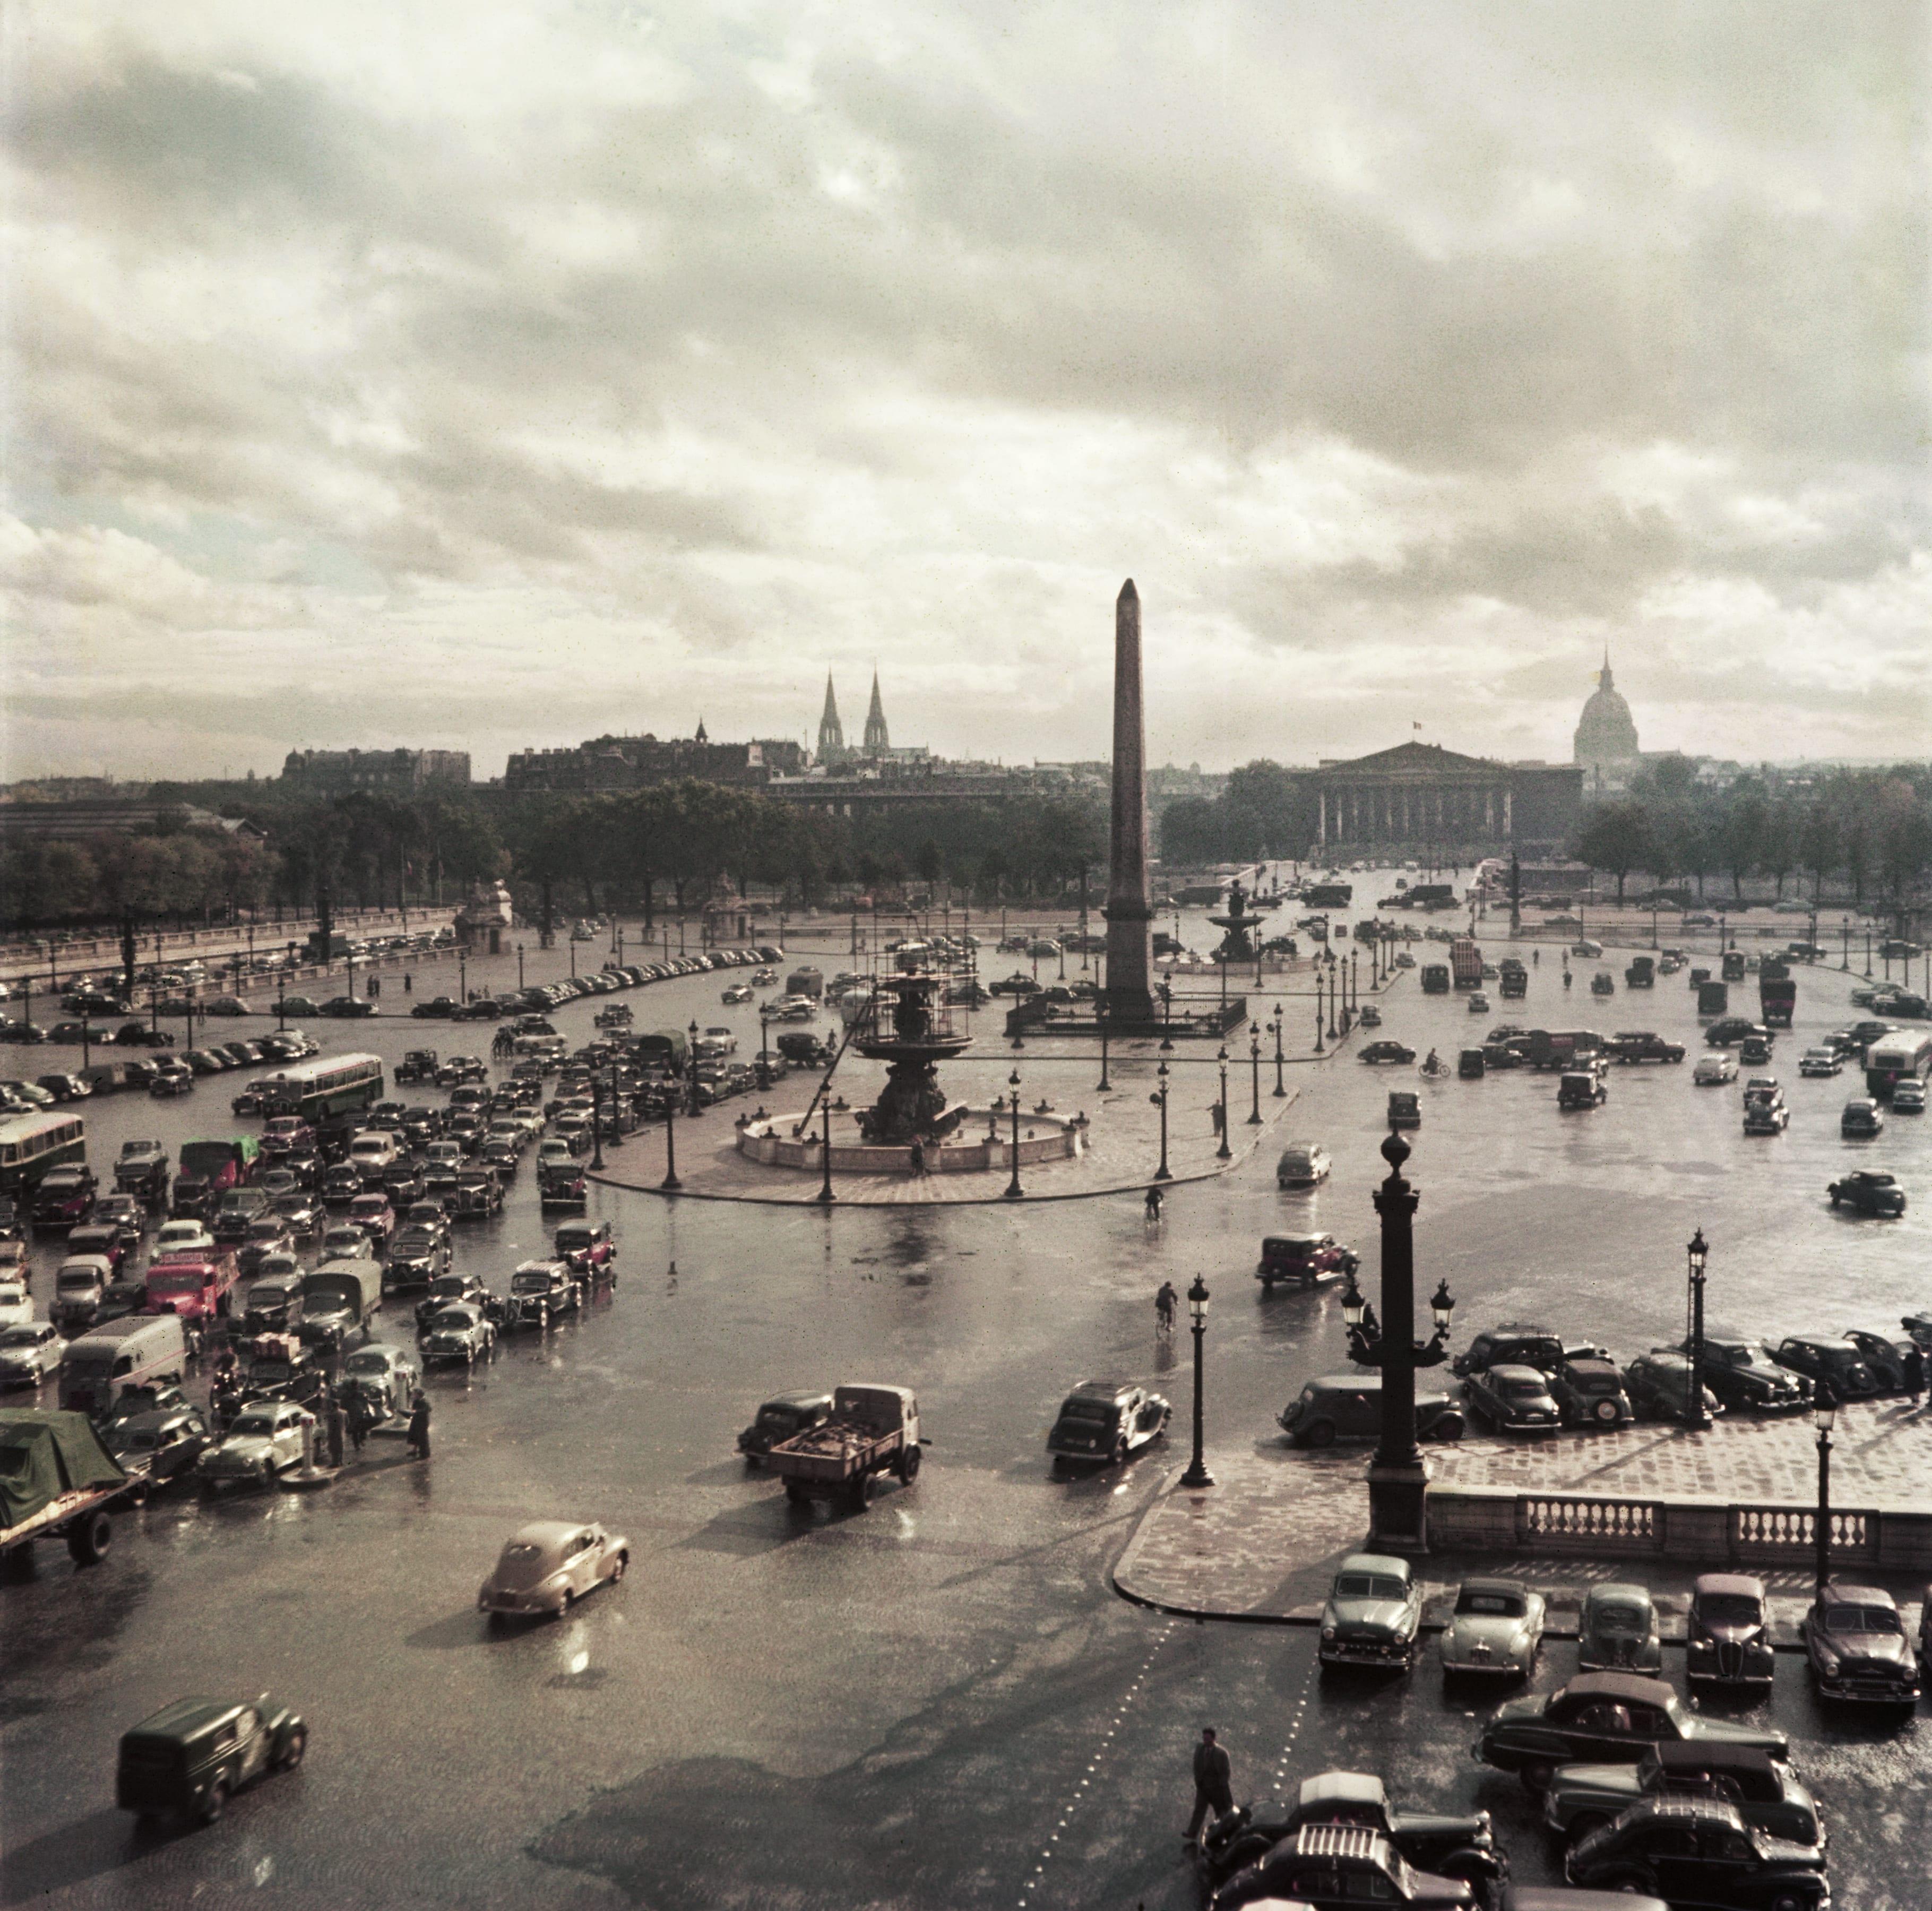 Place de la Concorde from the Time-Life office, Paris, ca. 1952. ©Robert Capa/International Center of Photography/Magnum Photos.